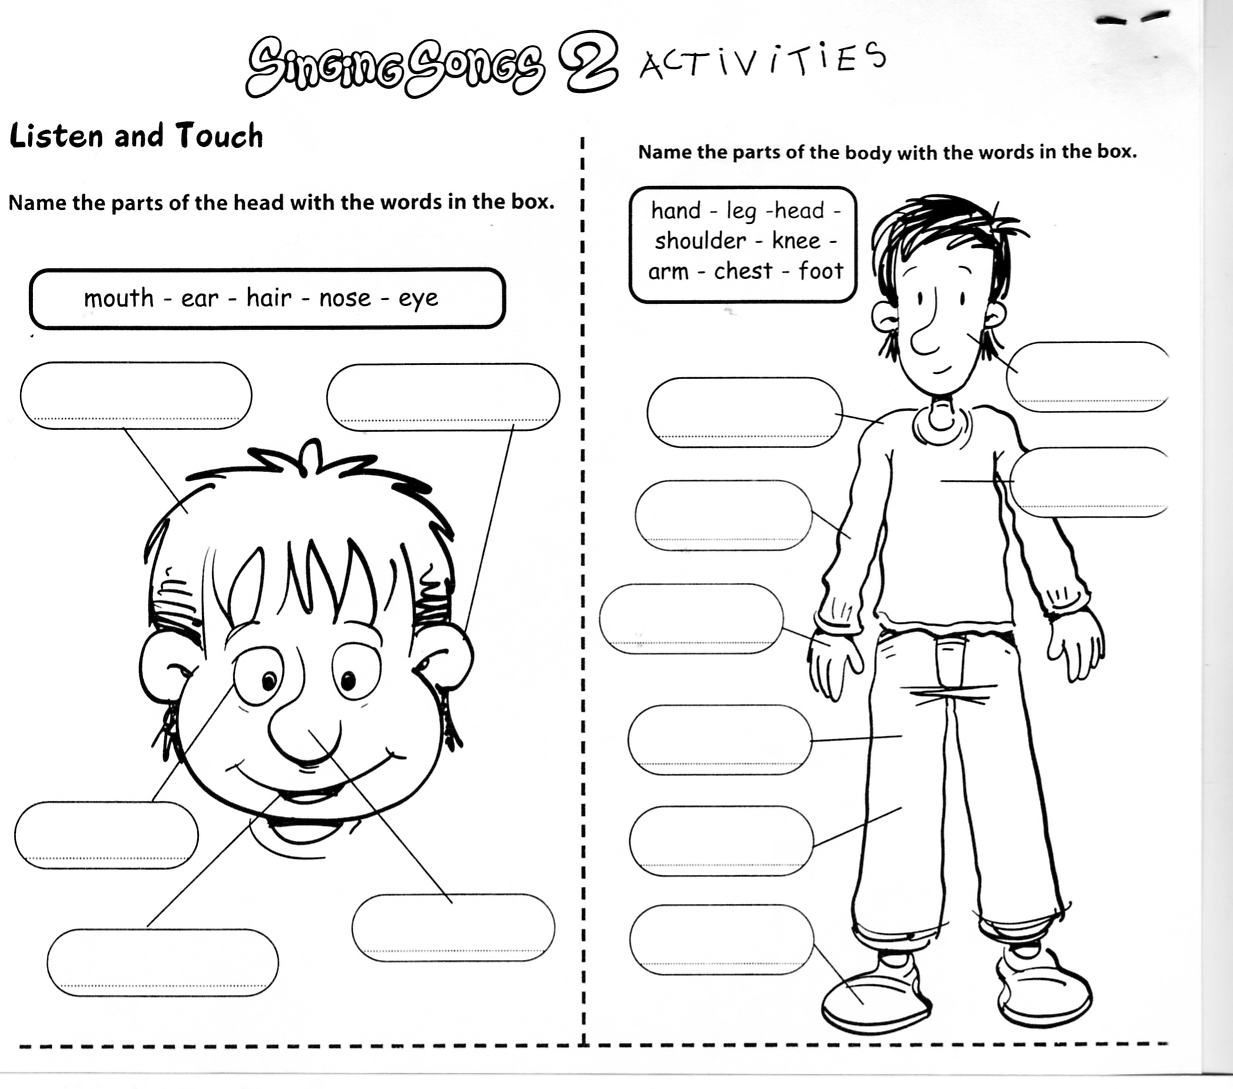 medium resolution of learningenglish-esl: BODY WORKSHEETS   Alphabet worksheets preschool